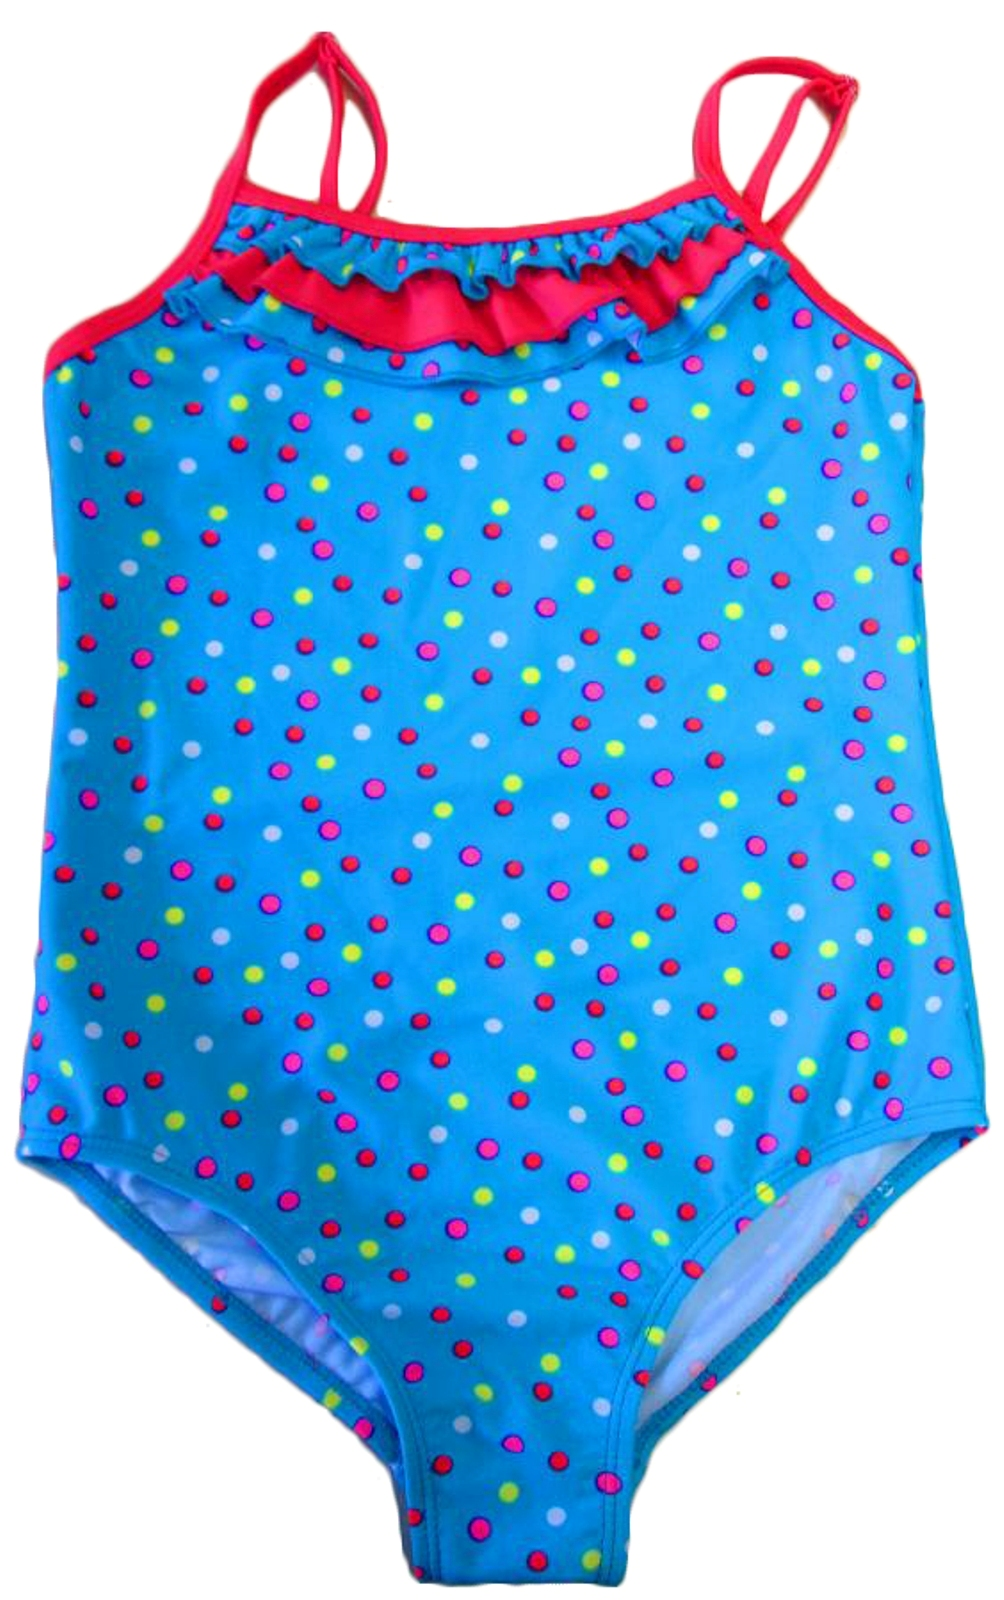 79aac30cc2 Swimming Costume Childrens & Rash Guards Boys Sun Protective Swimwear